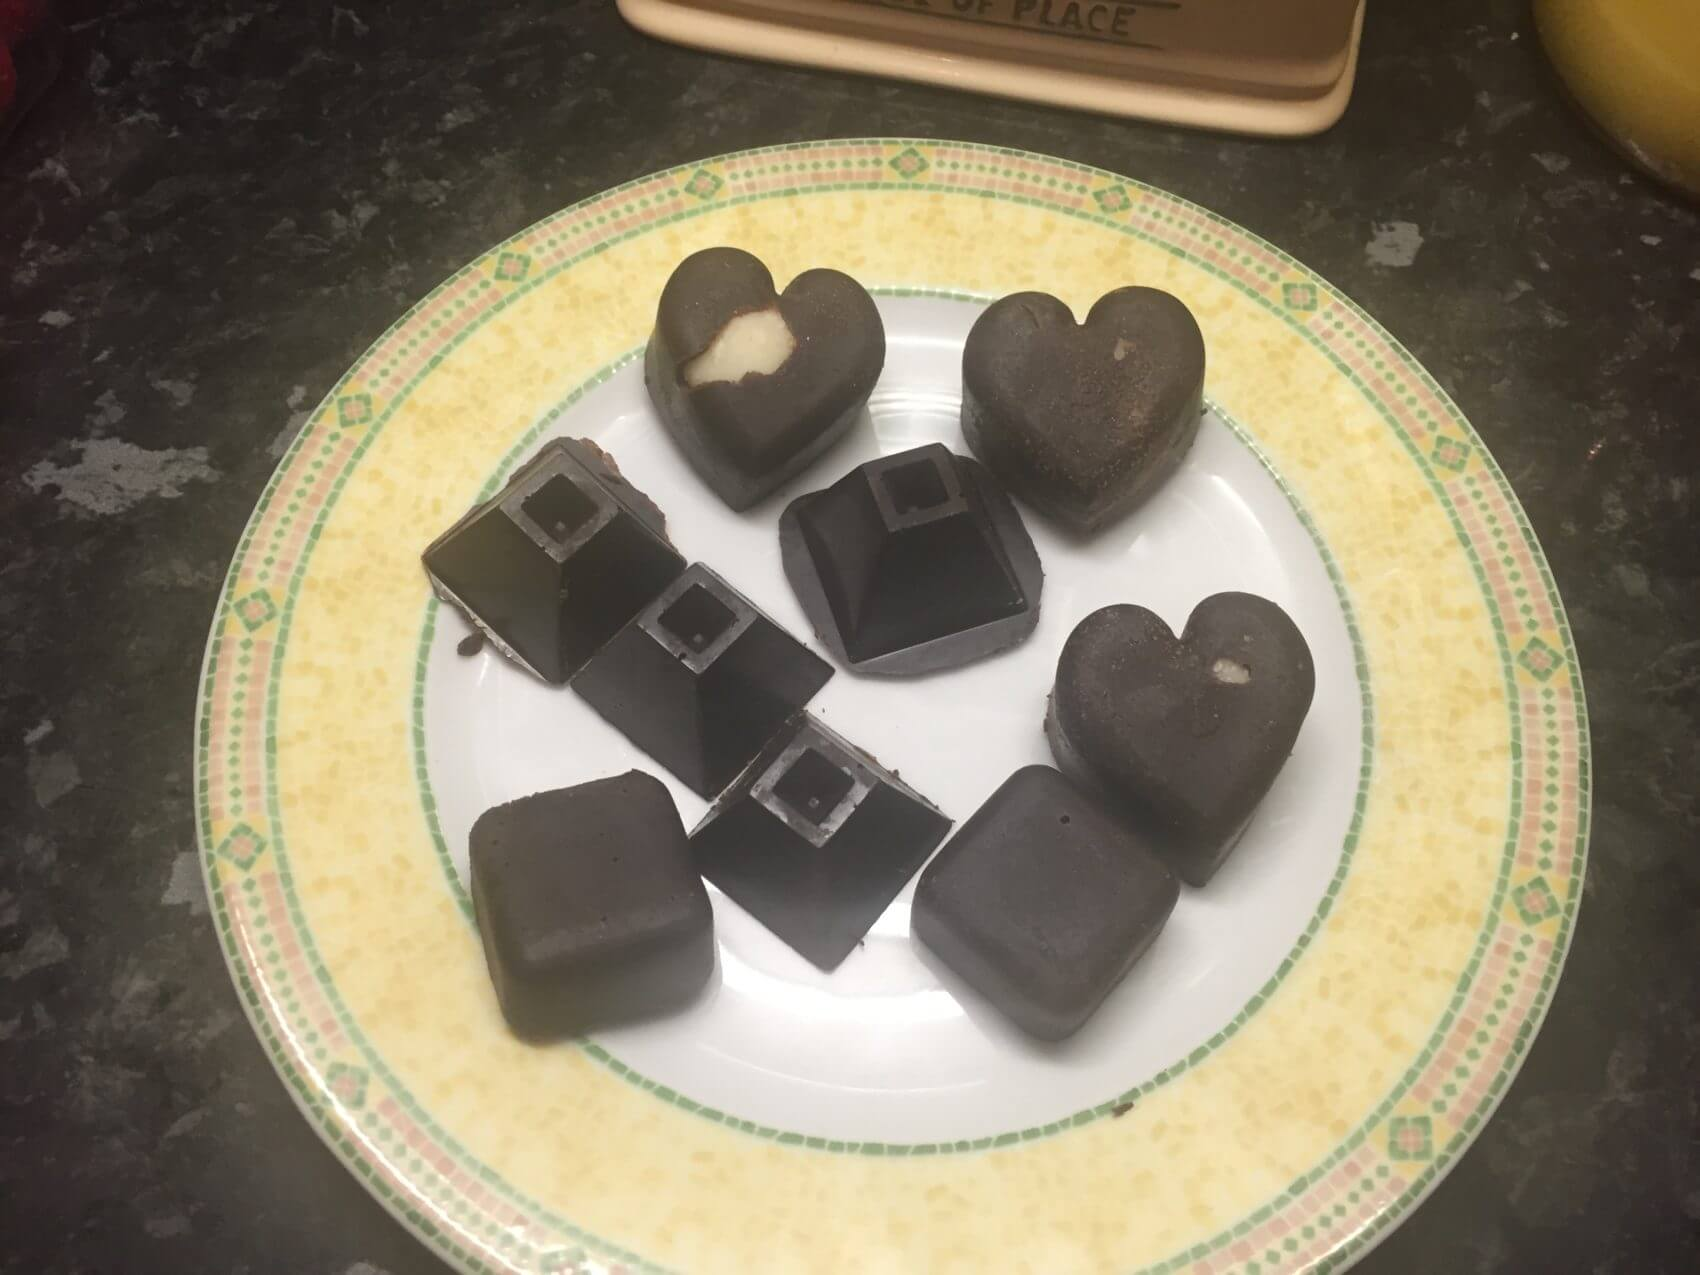 low carb keto chocolates and chocolate bars